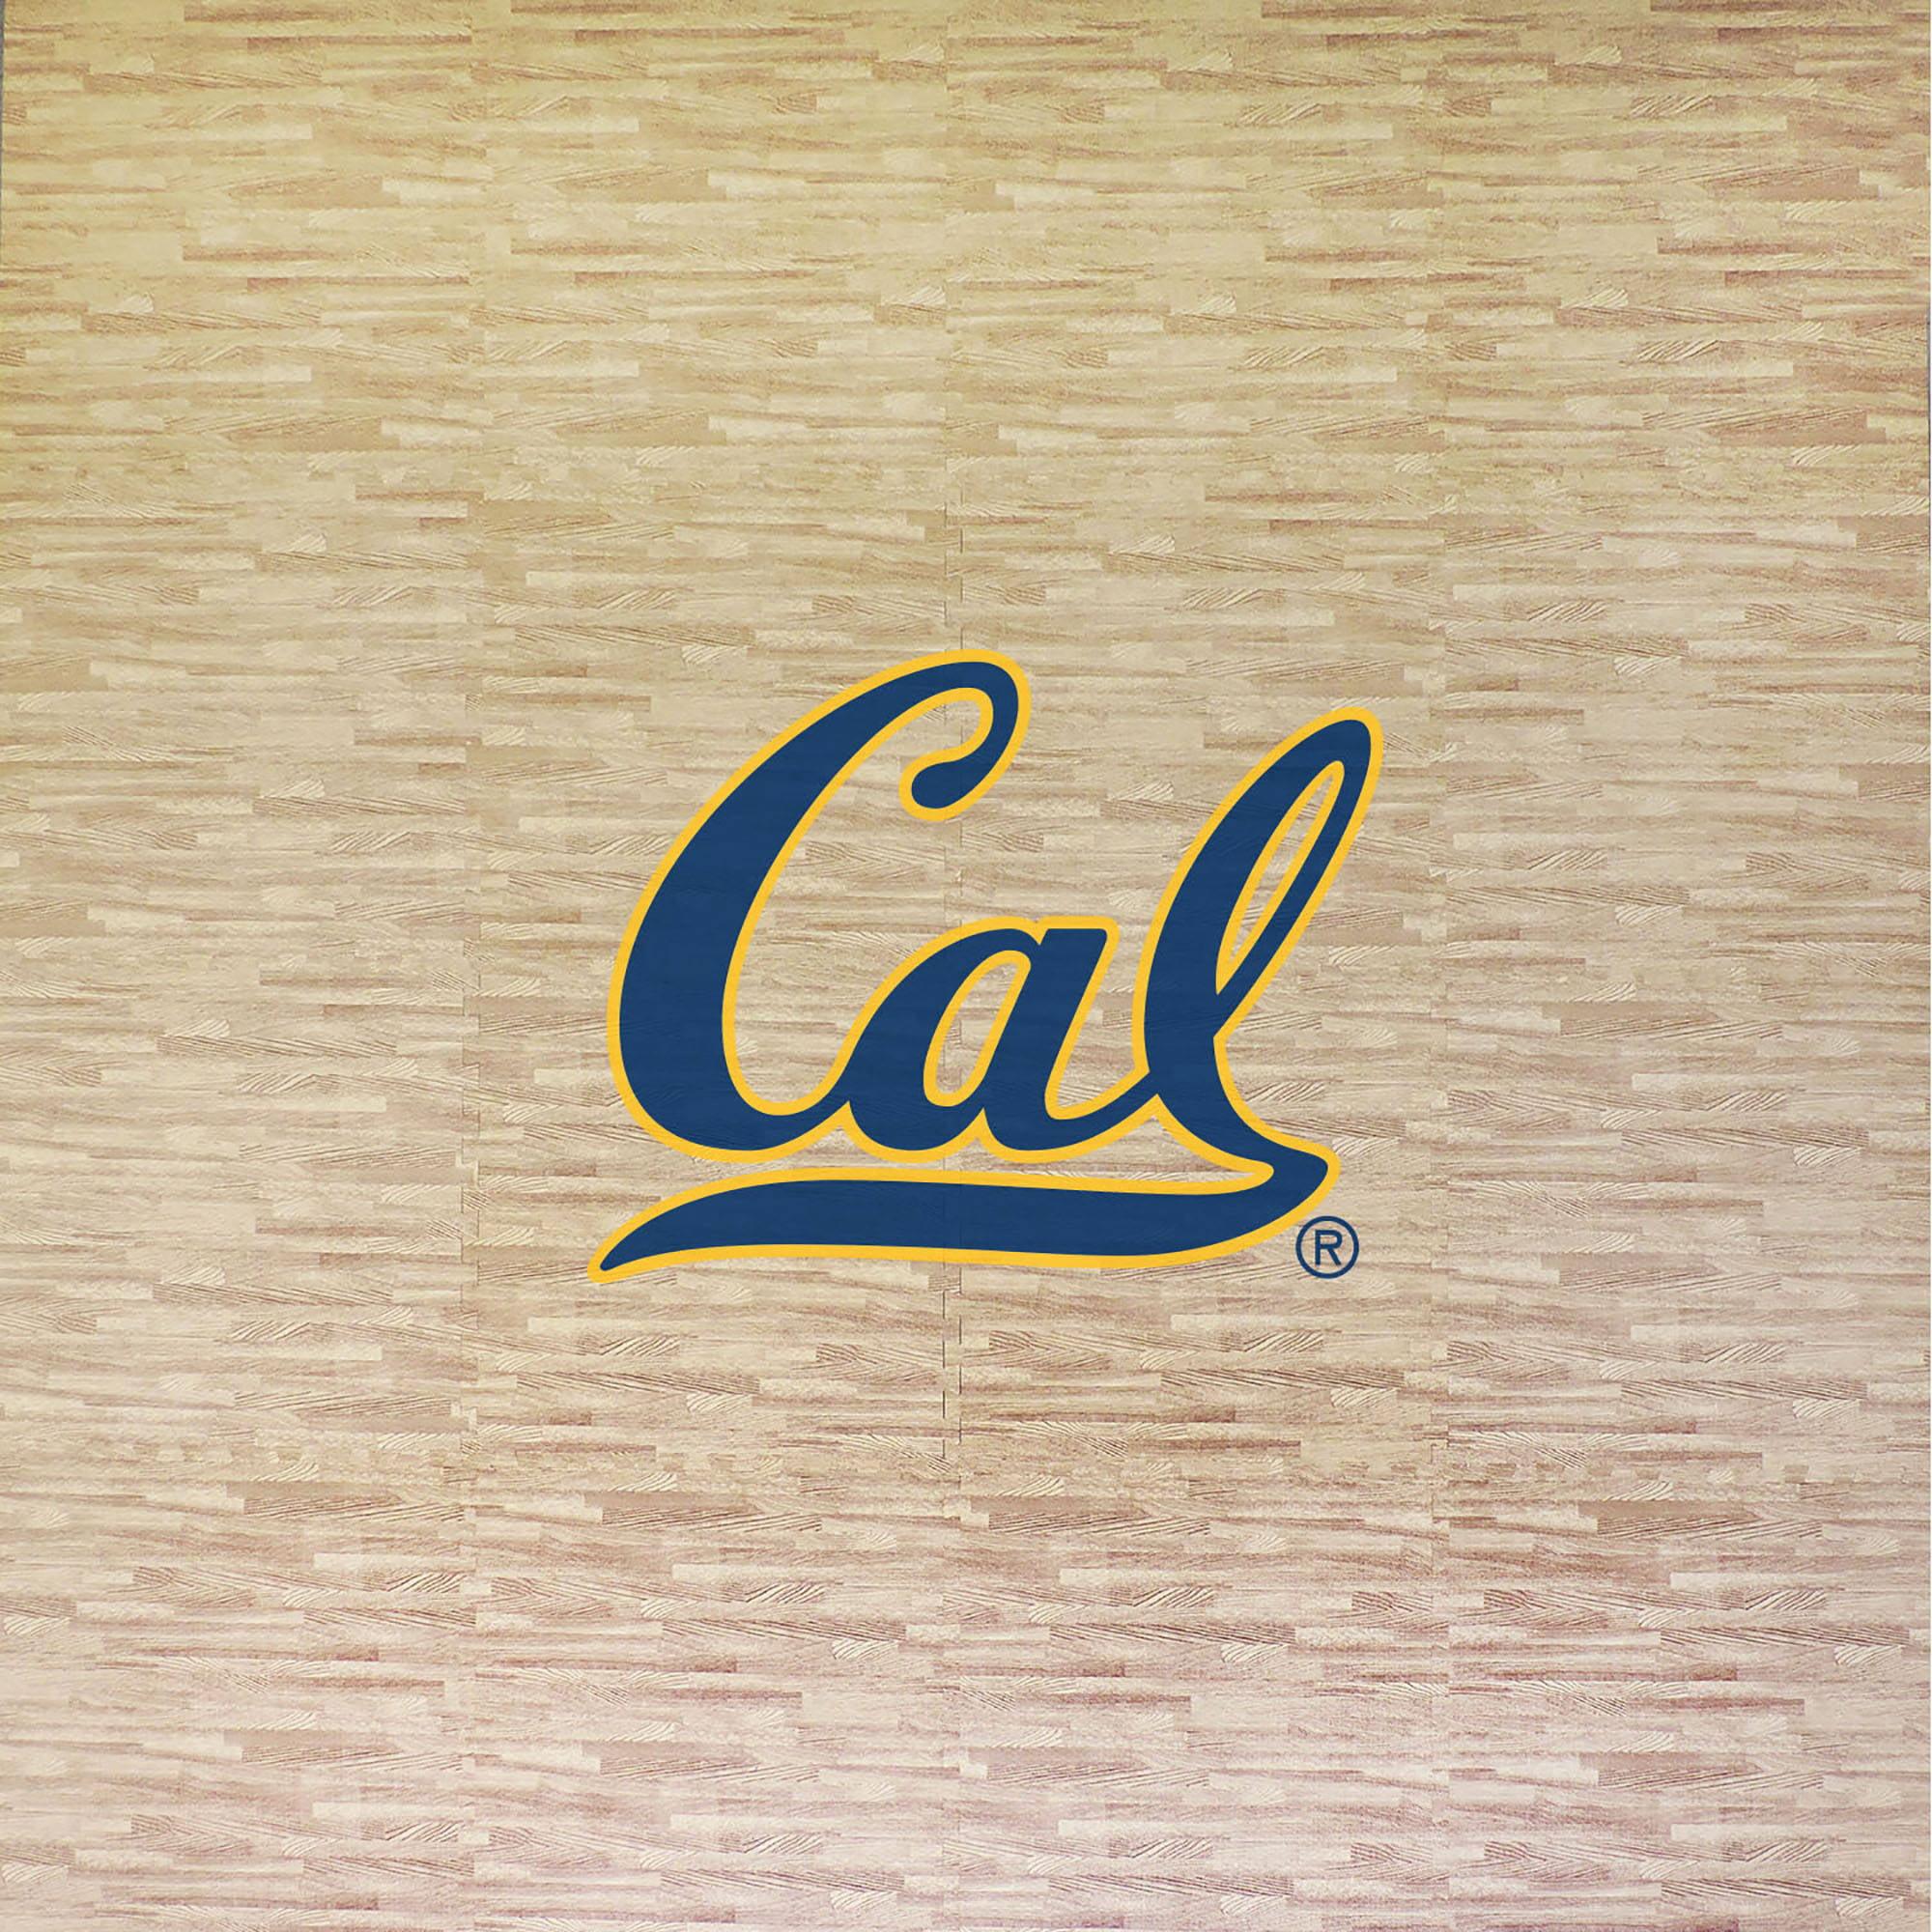 University of California Berkeley Portable Foam Puzzle Tailgate Floor Mat by